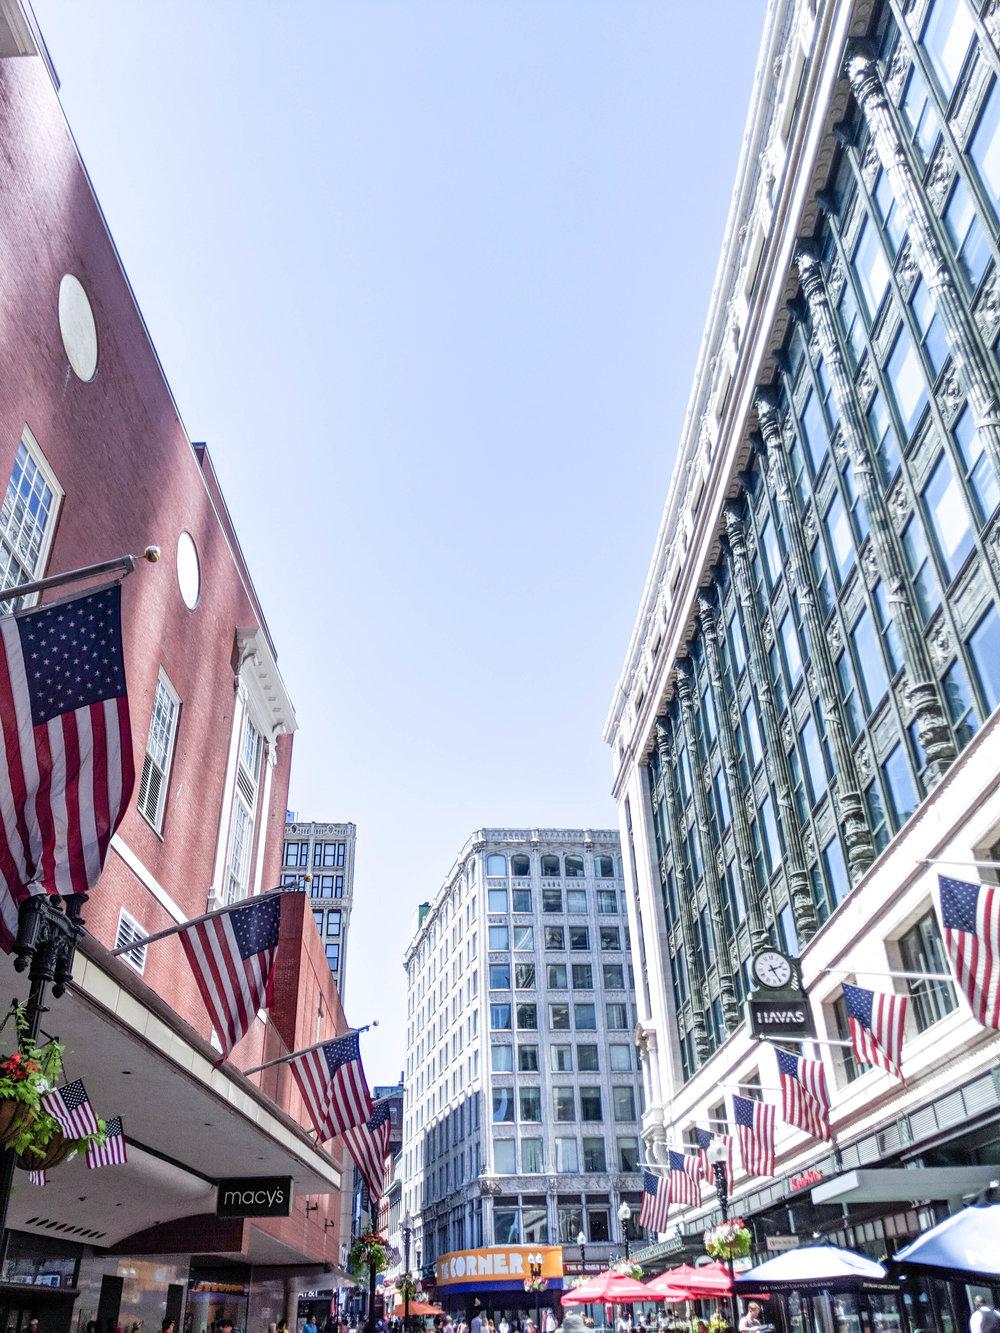 bri rinehart; american flags; boston; photography